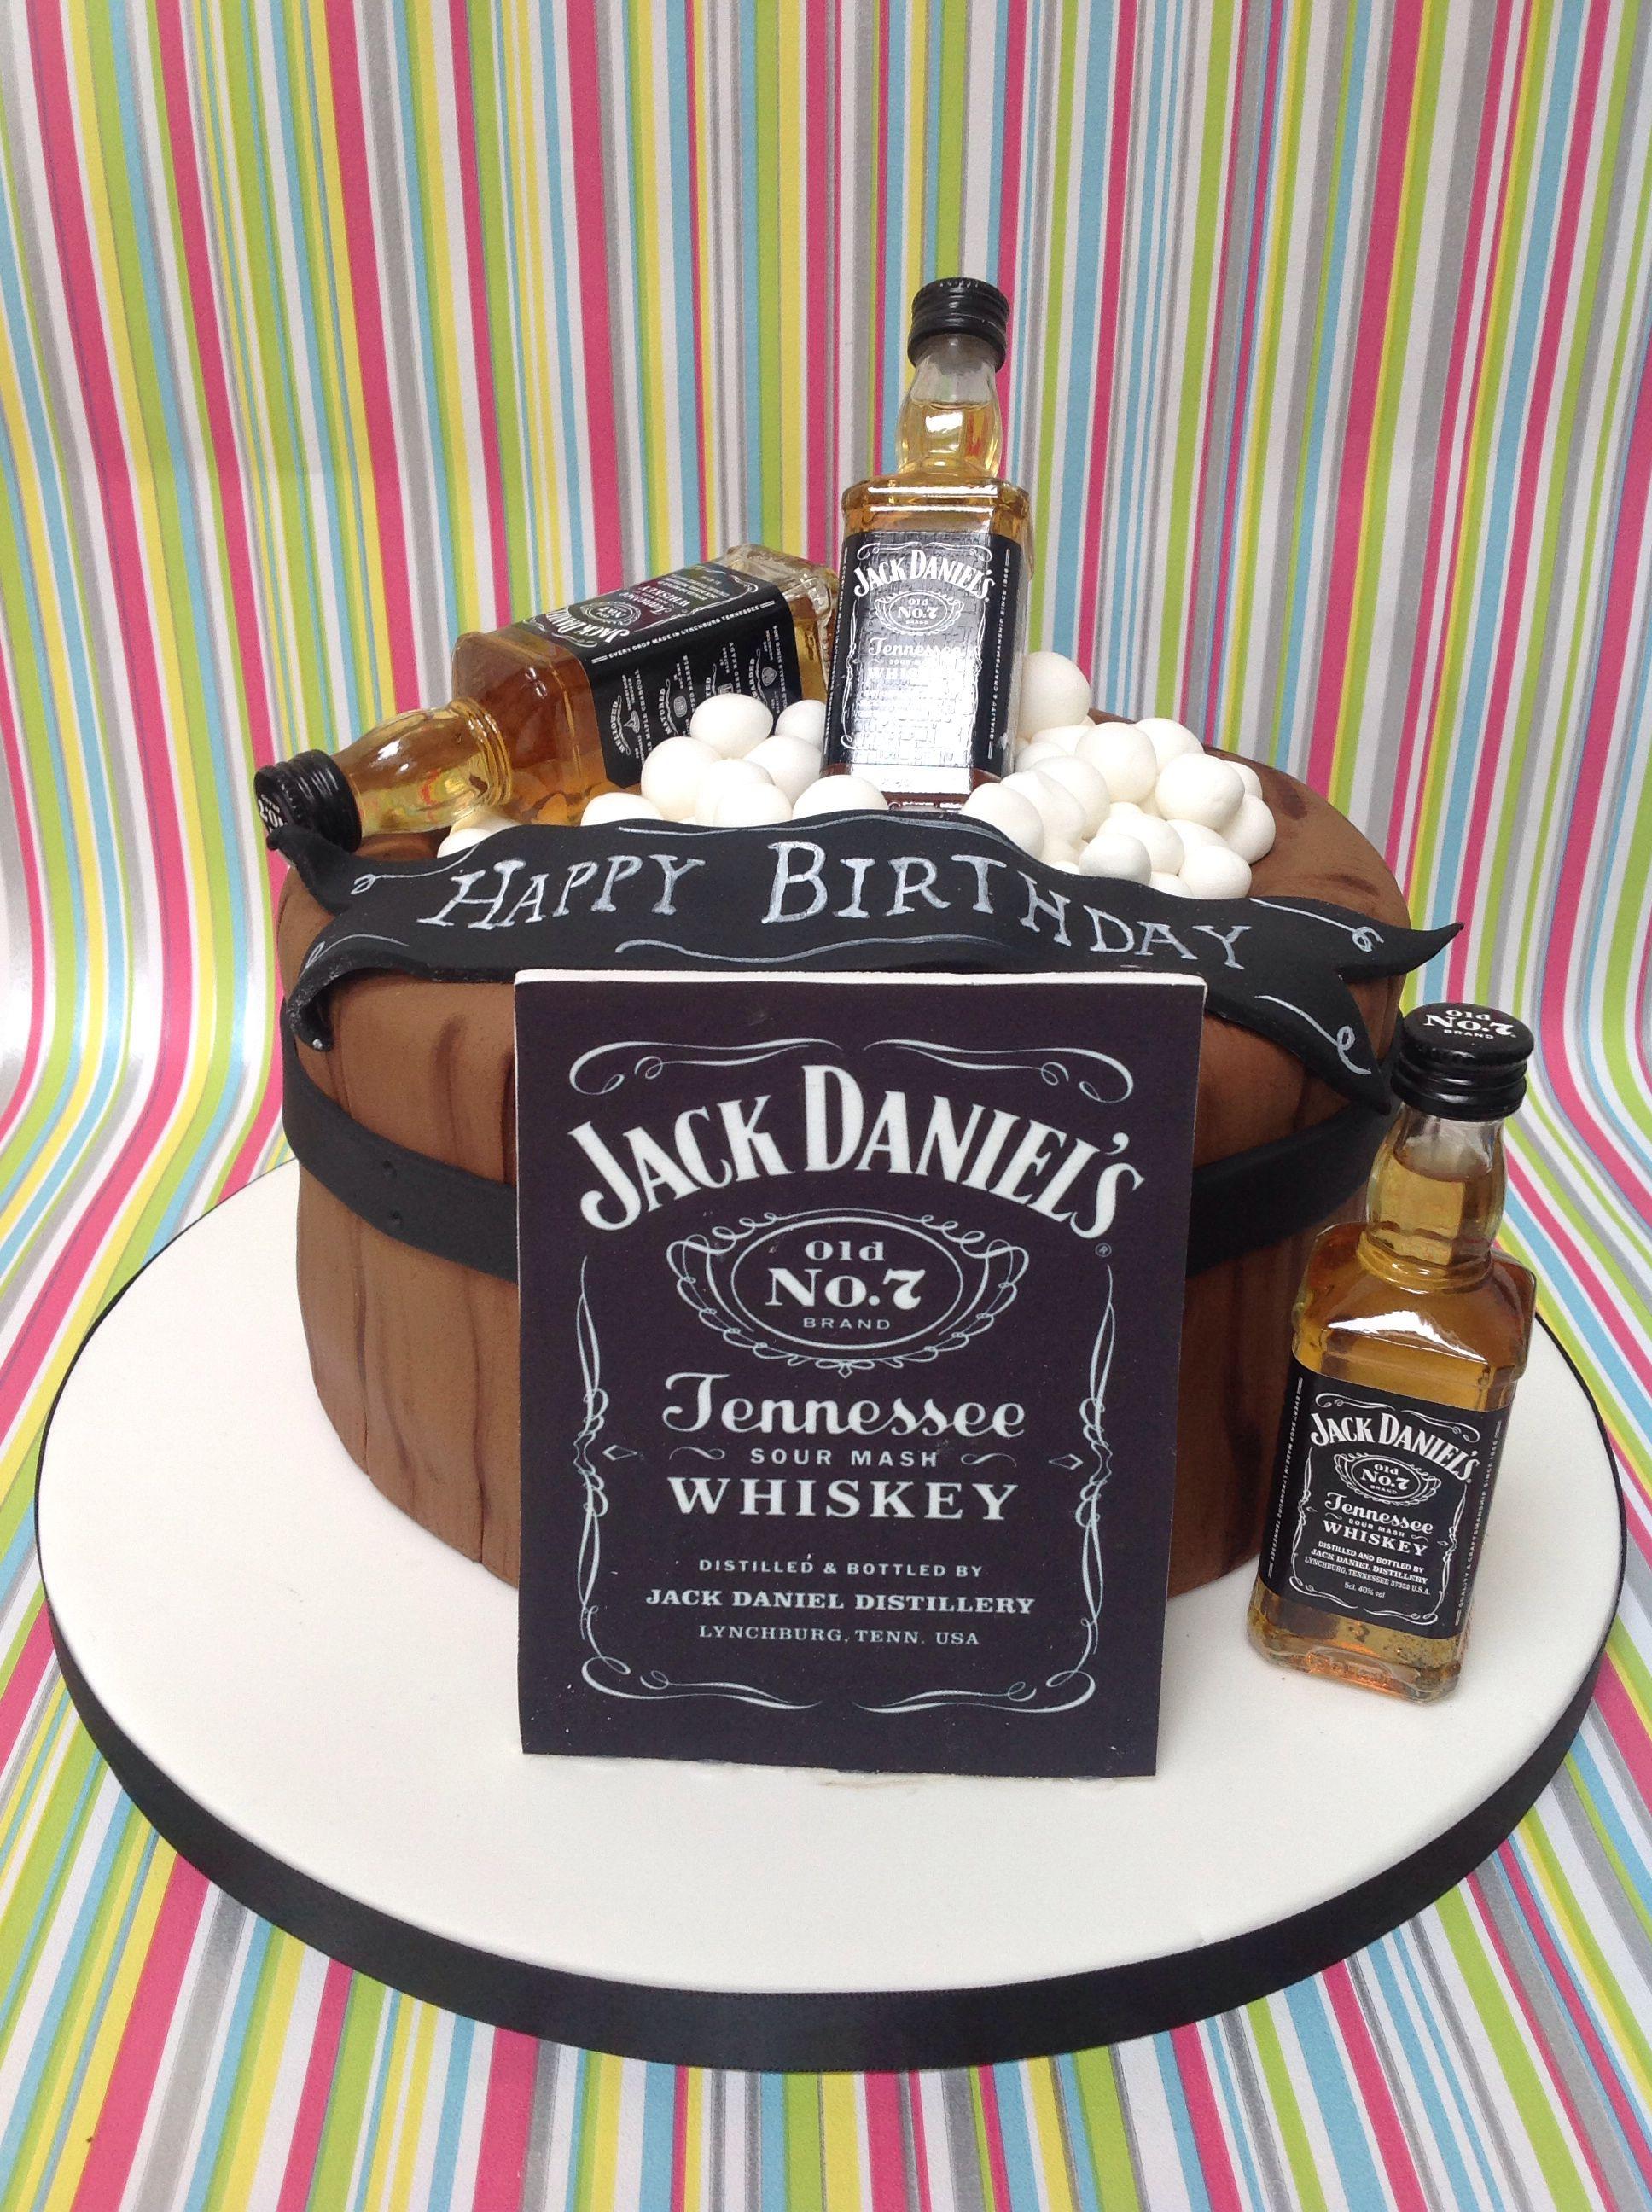 Jack Daniels Cake 50 Birthday In 2019 Pinterest Geburtstag